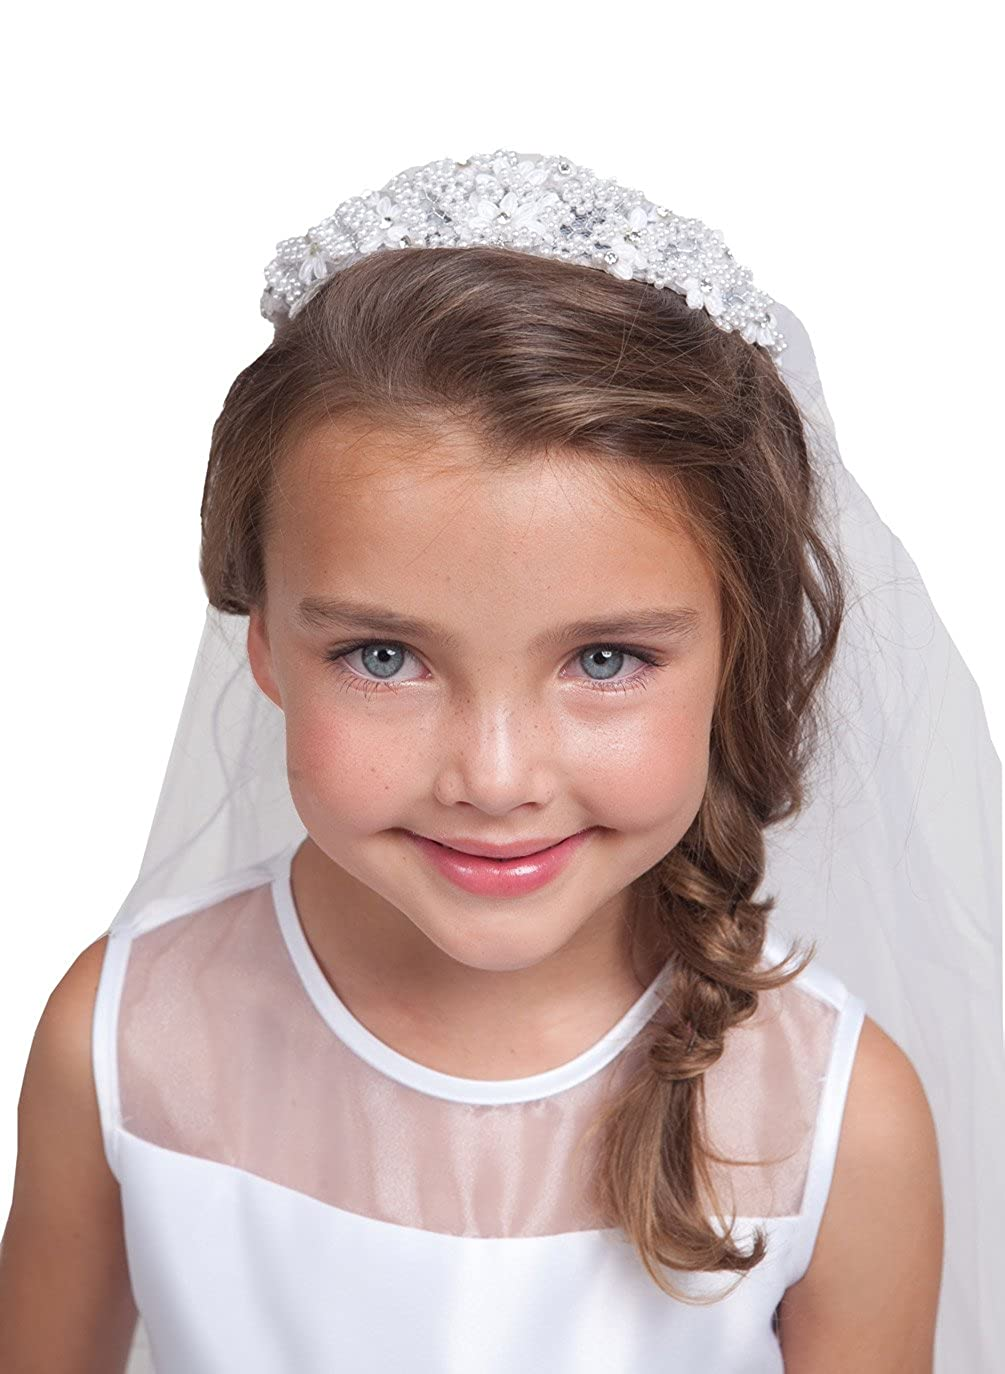 Pearl & Rhinestone White Tiara with Attached Veil ~ (Kid v65) KID-v65-Veil